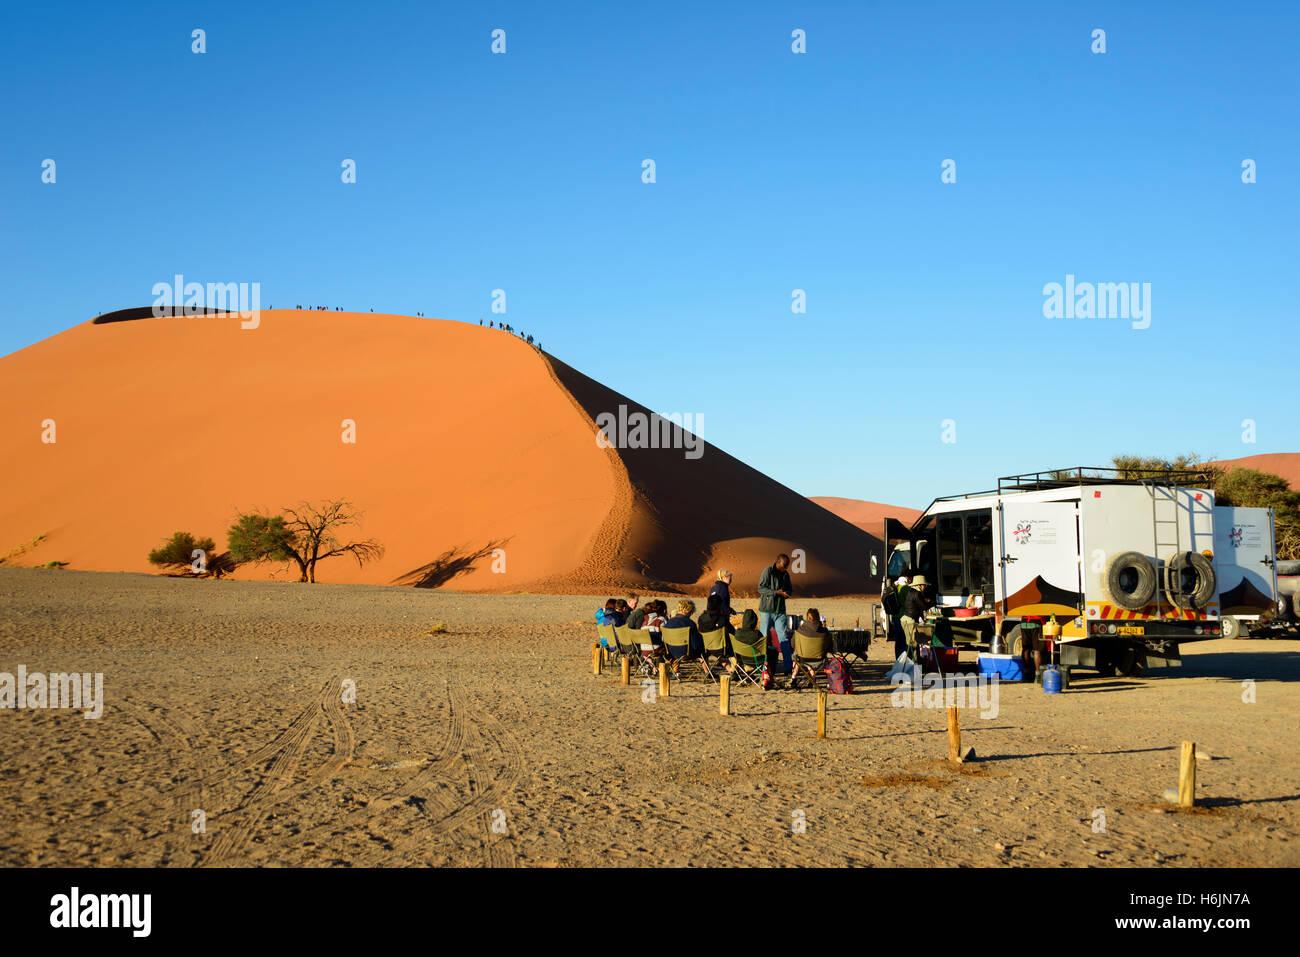 Dune 45 avec safari touristes à Namib-Naukluft National Park dans le désert du Namib, Namibie Photo Stock